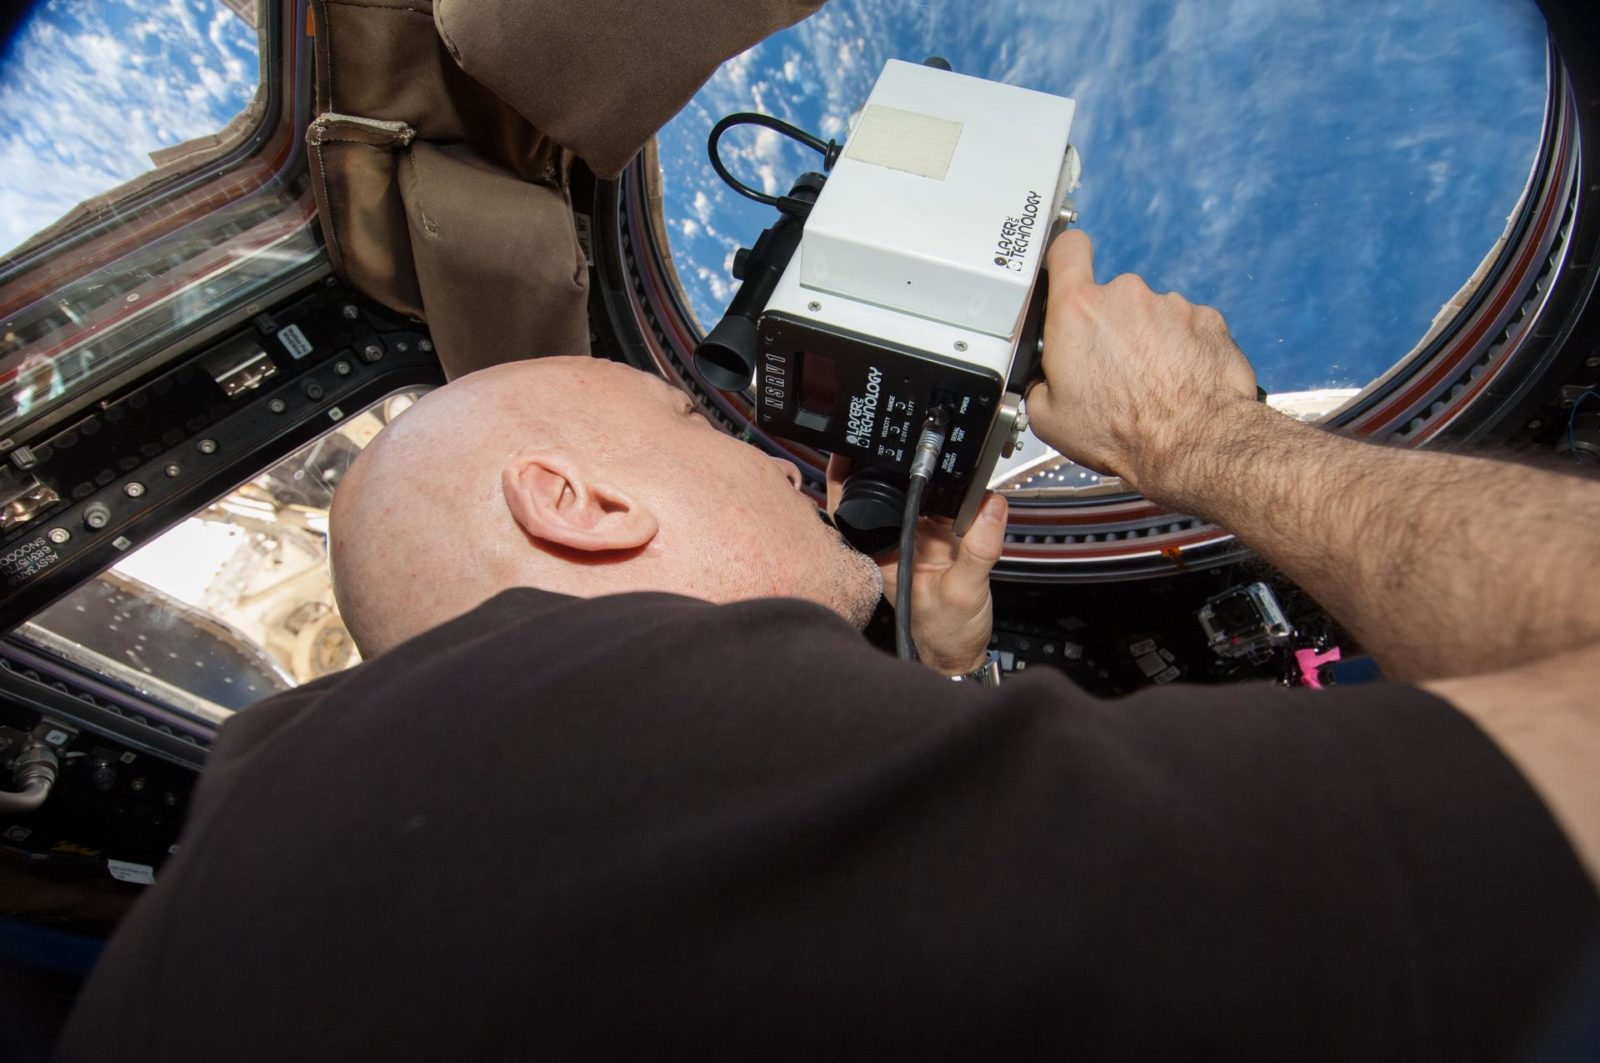 Documenting Cygnus Capture by Canadarm2